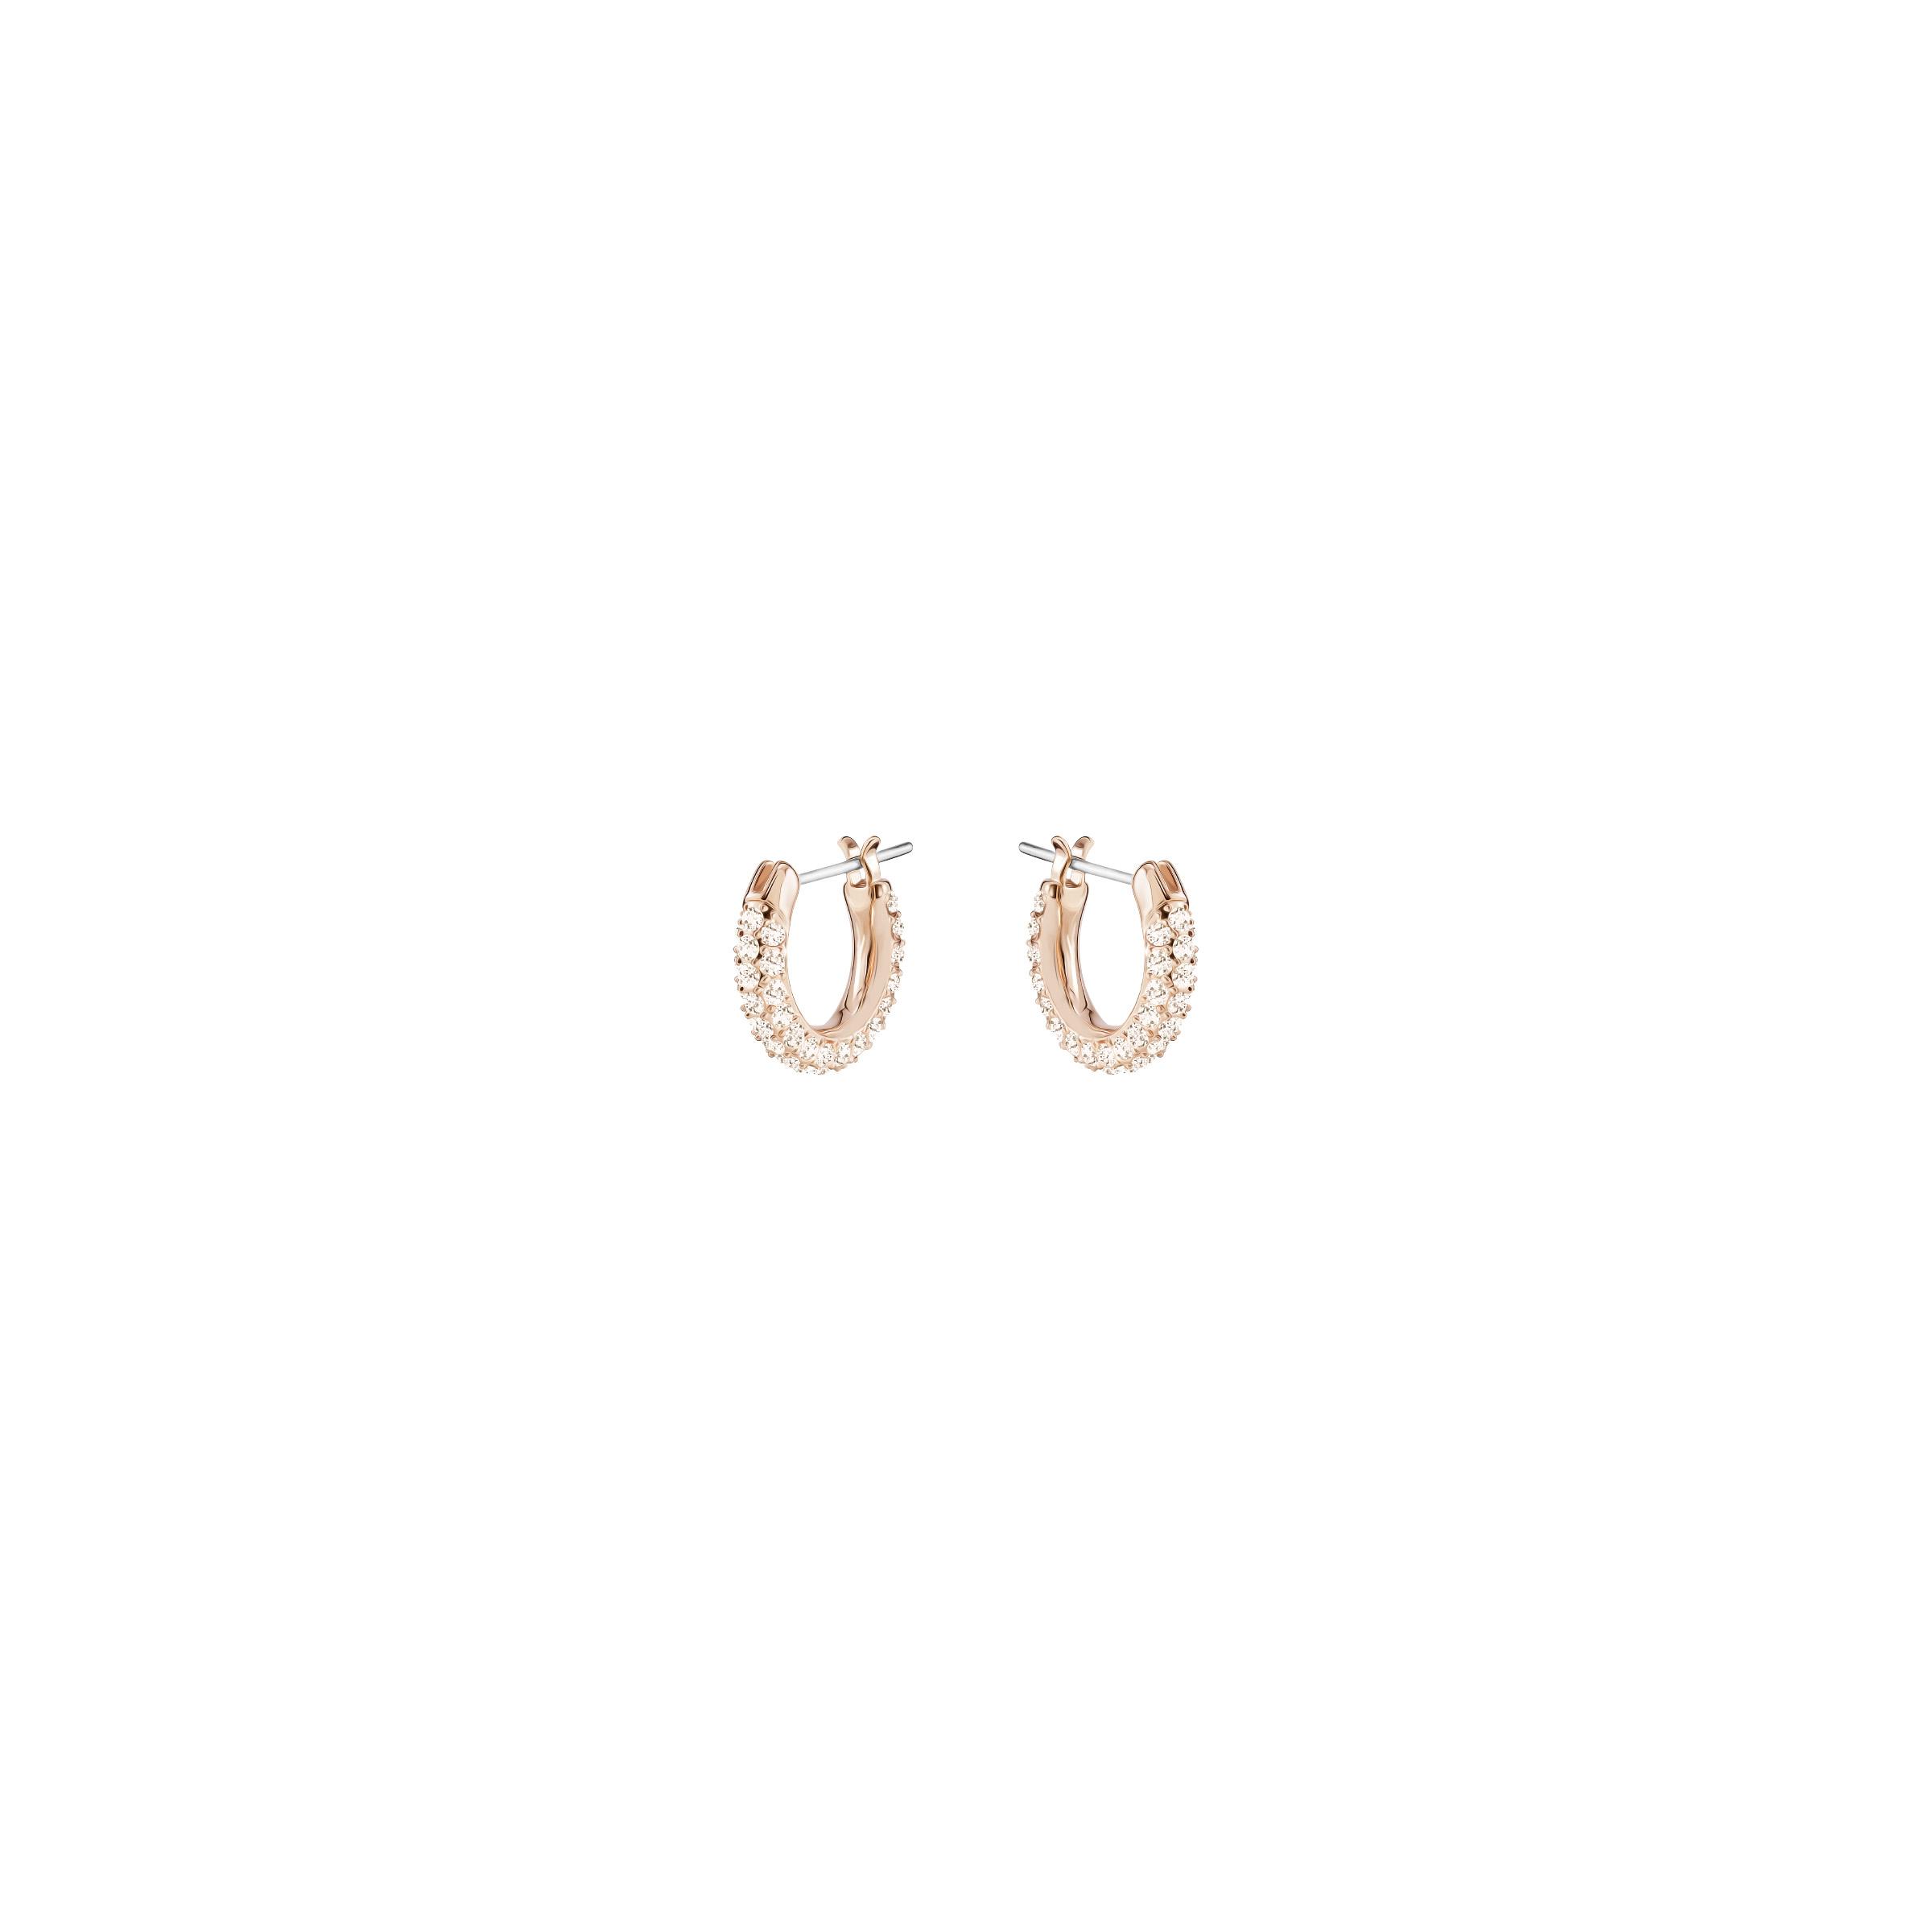 Boucles d'oreilles Stone, rose, Métal doré rose, Swarovski